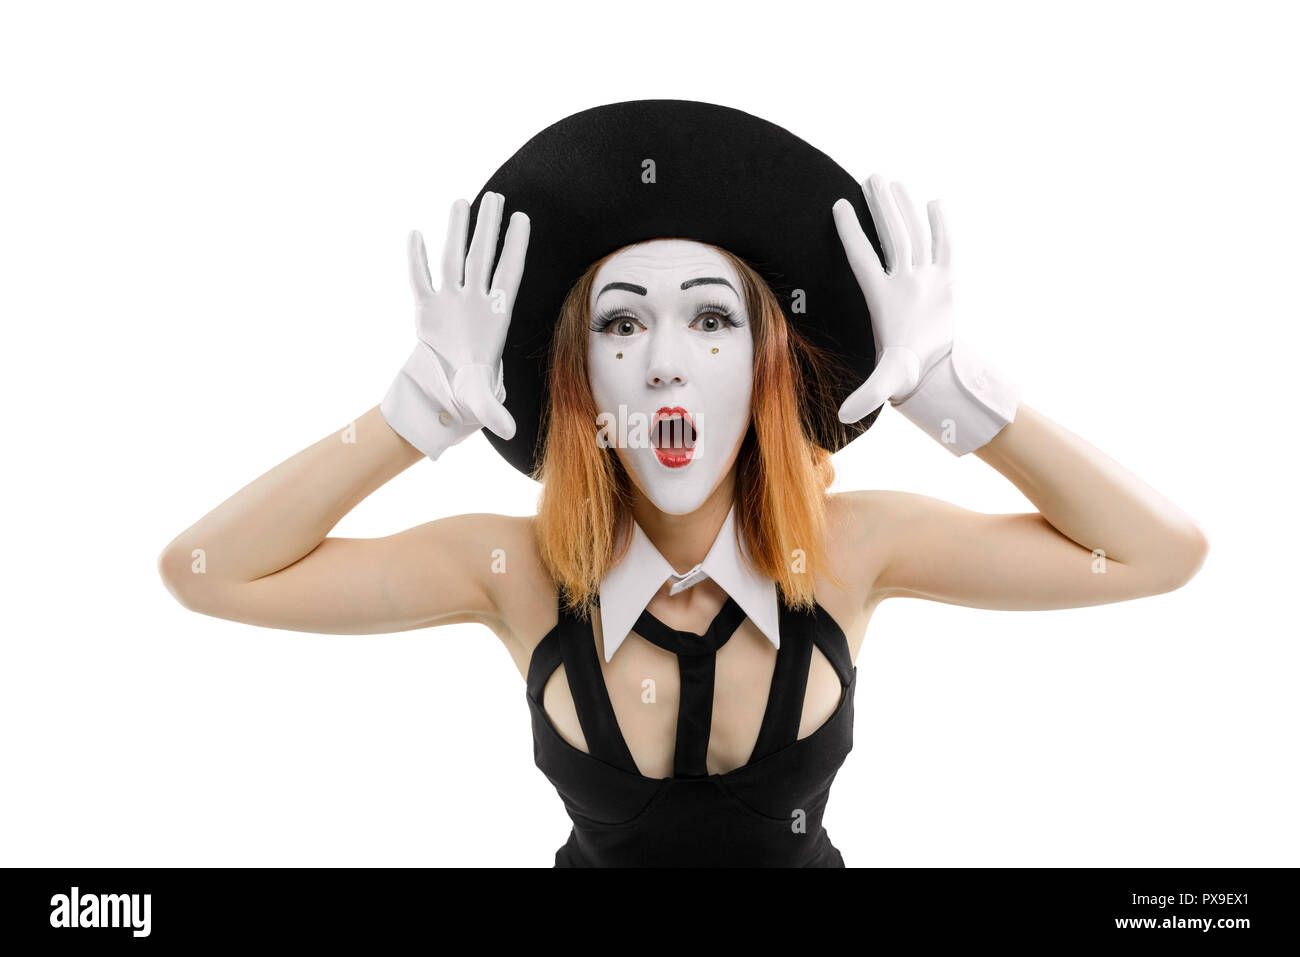 Female mime on white. - Stock Image